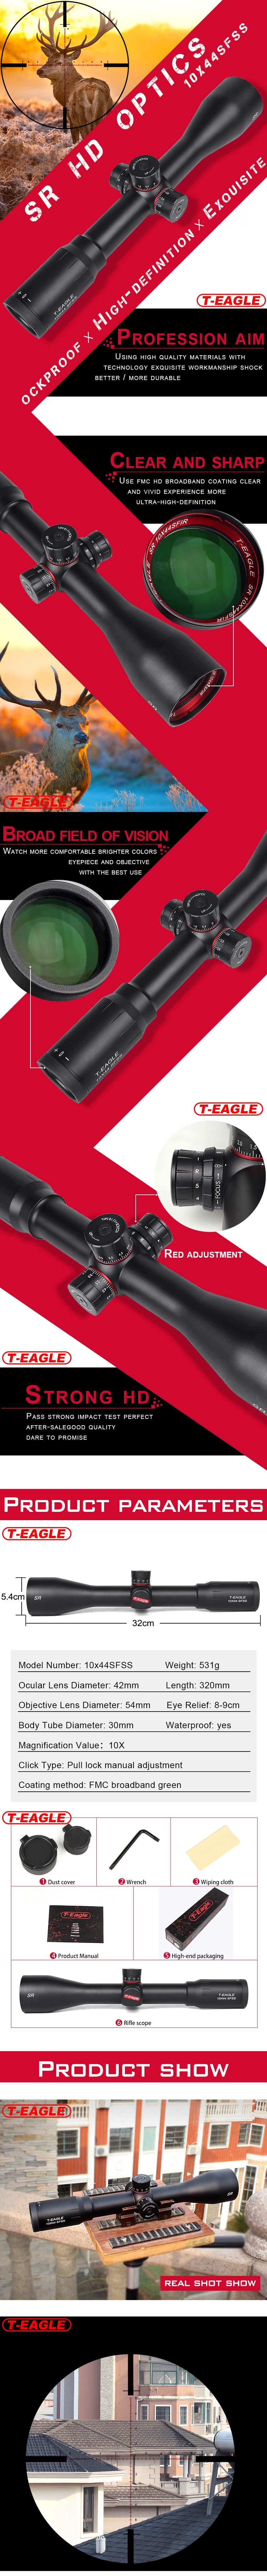 Riflescope pic -1